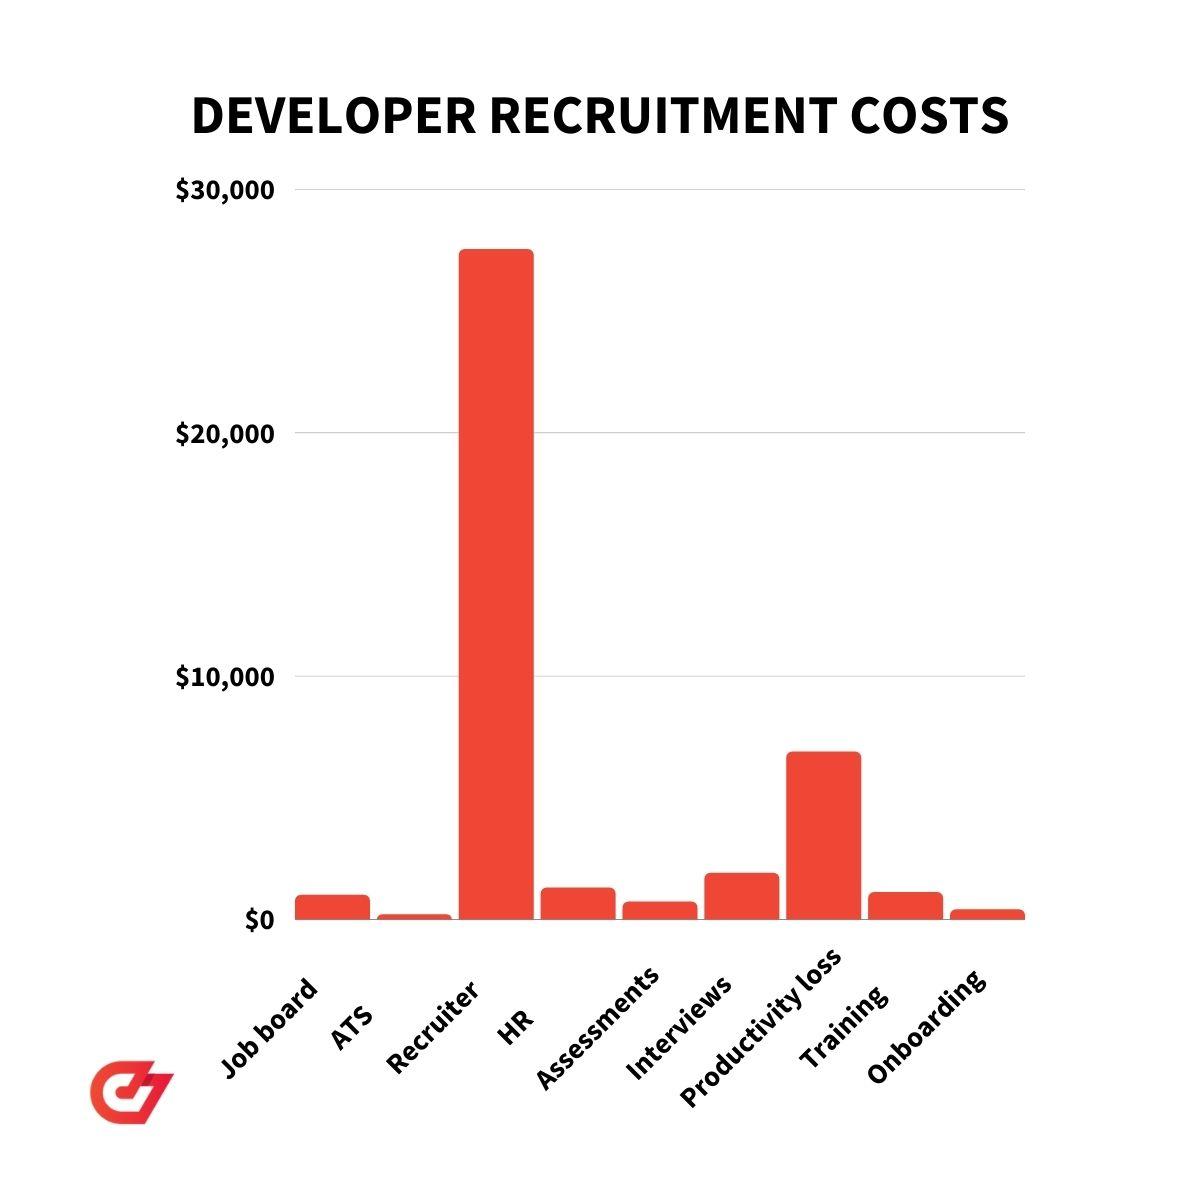 A breakdown of developer recruitment costs